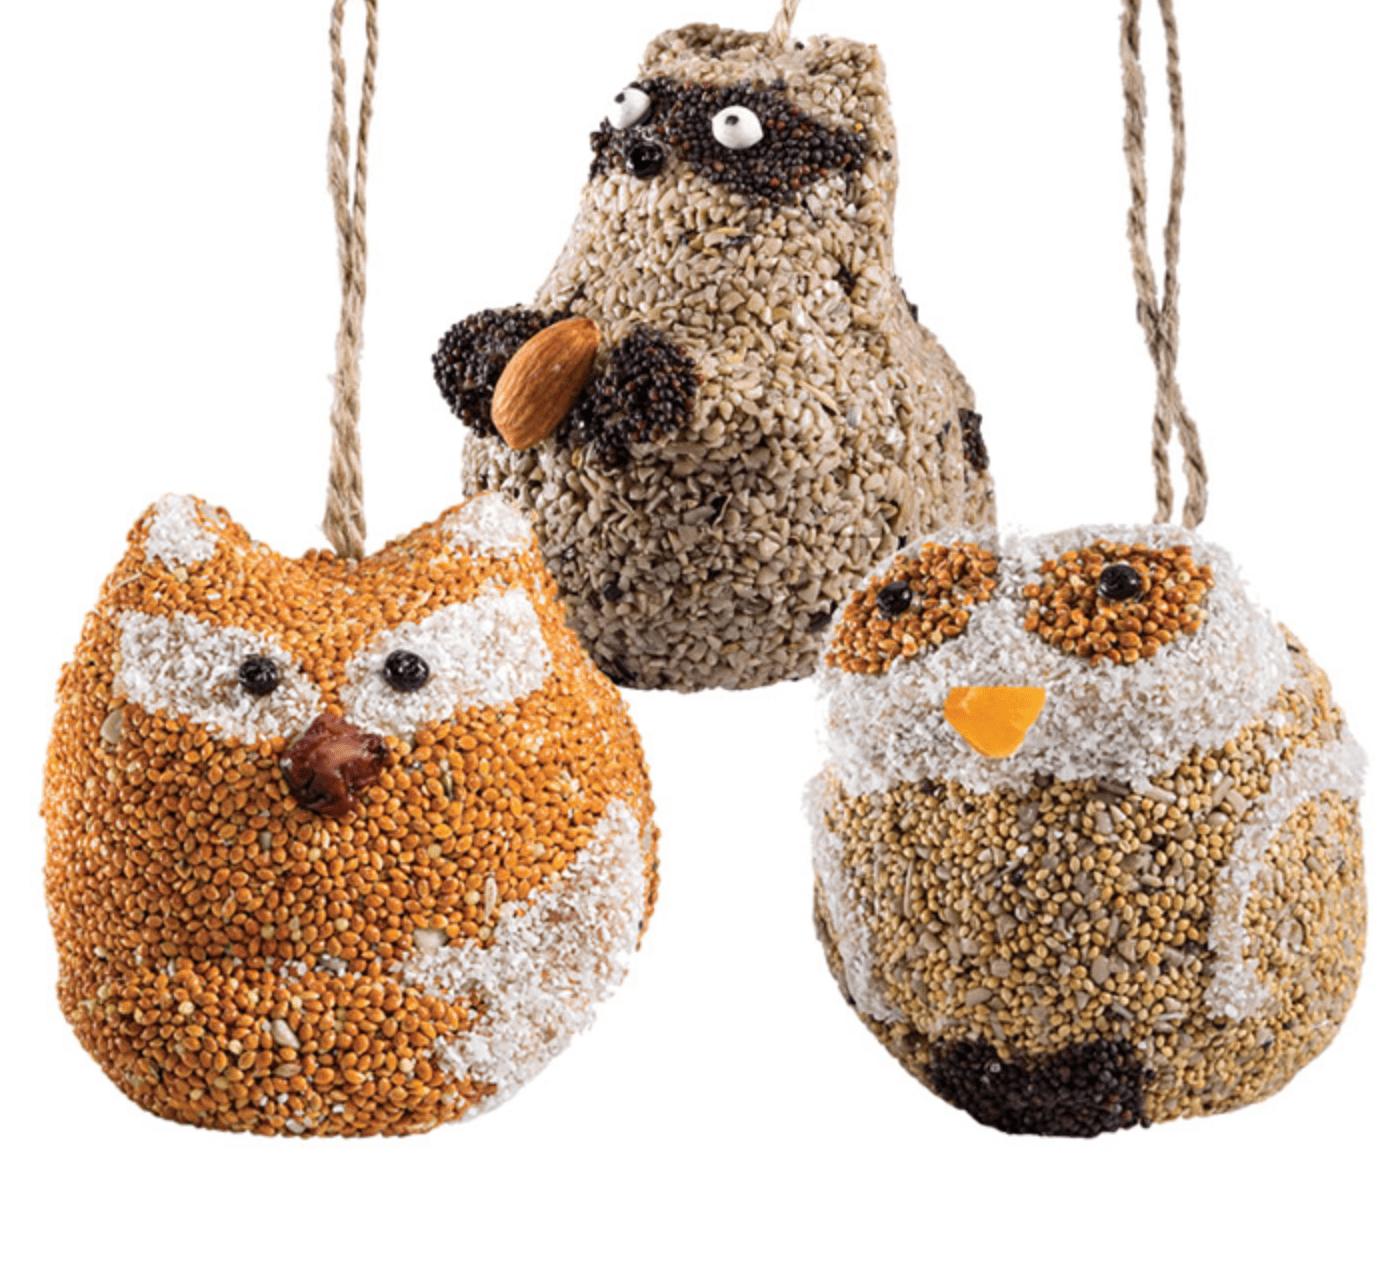 A fox, owl and raccoon seed ornament.